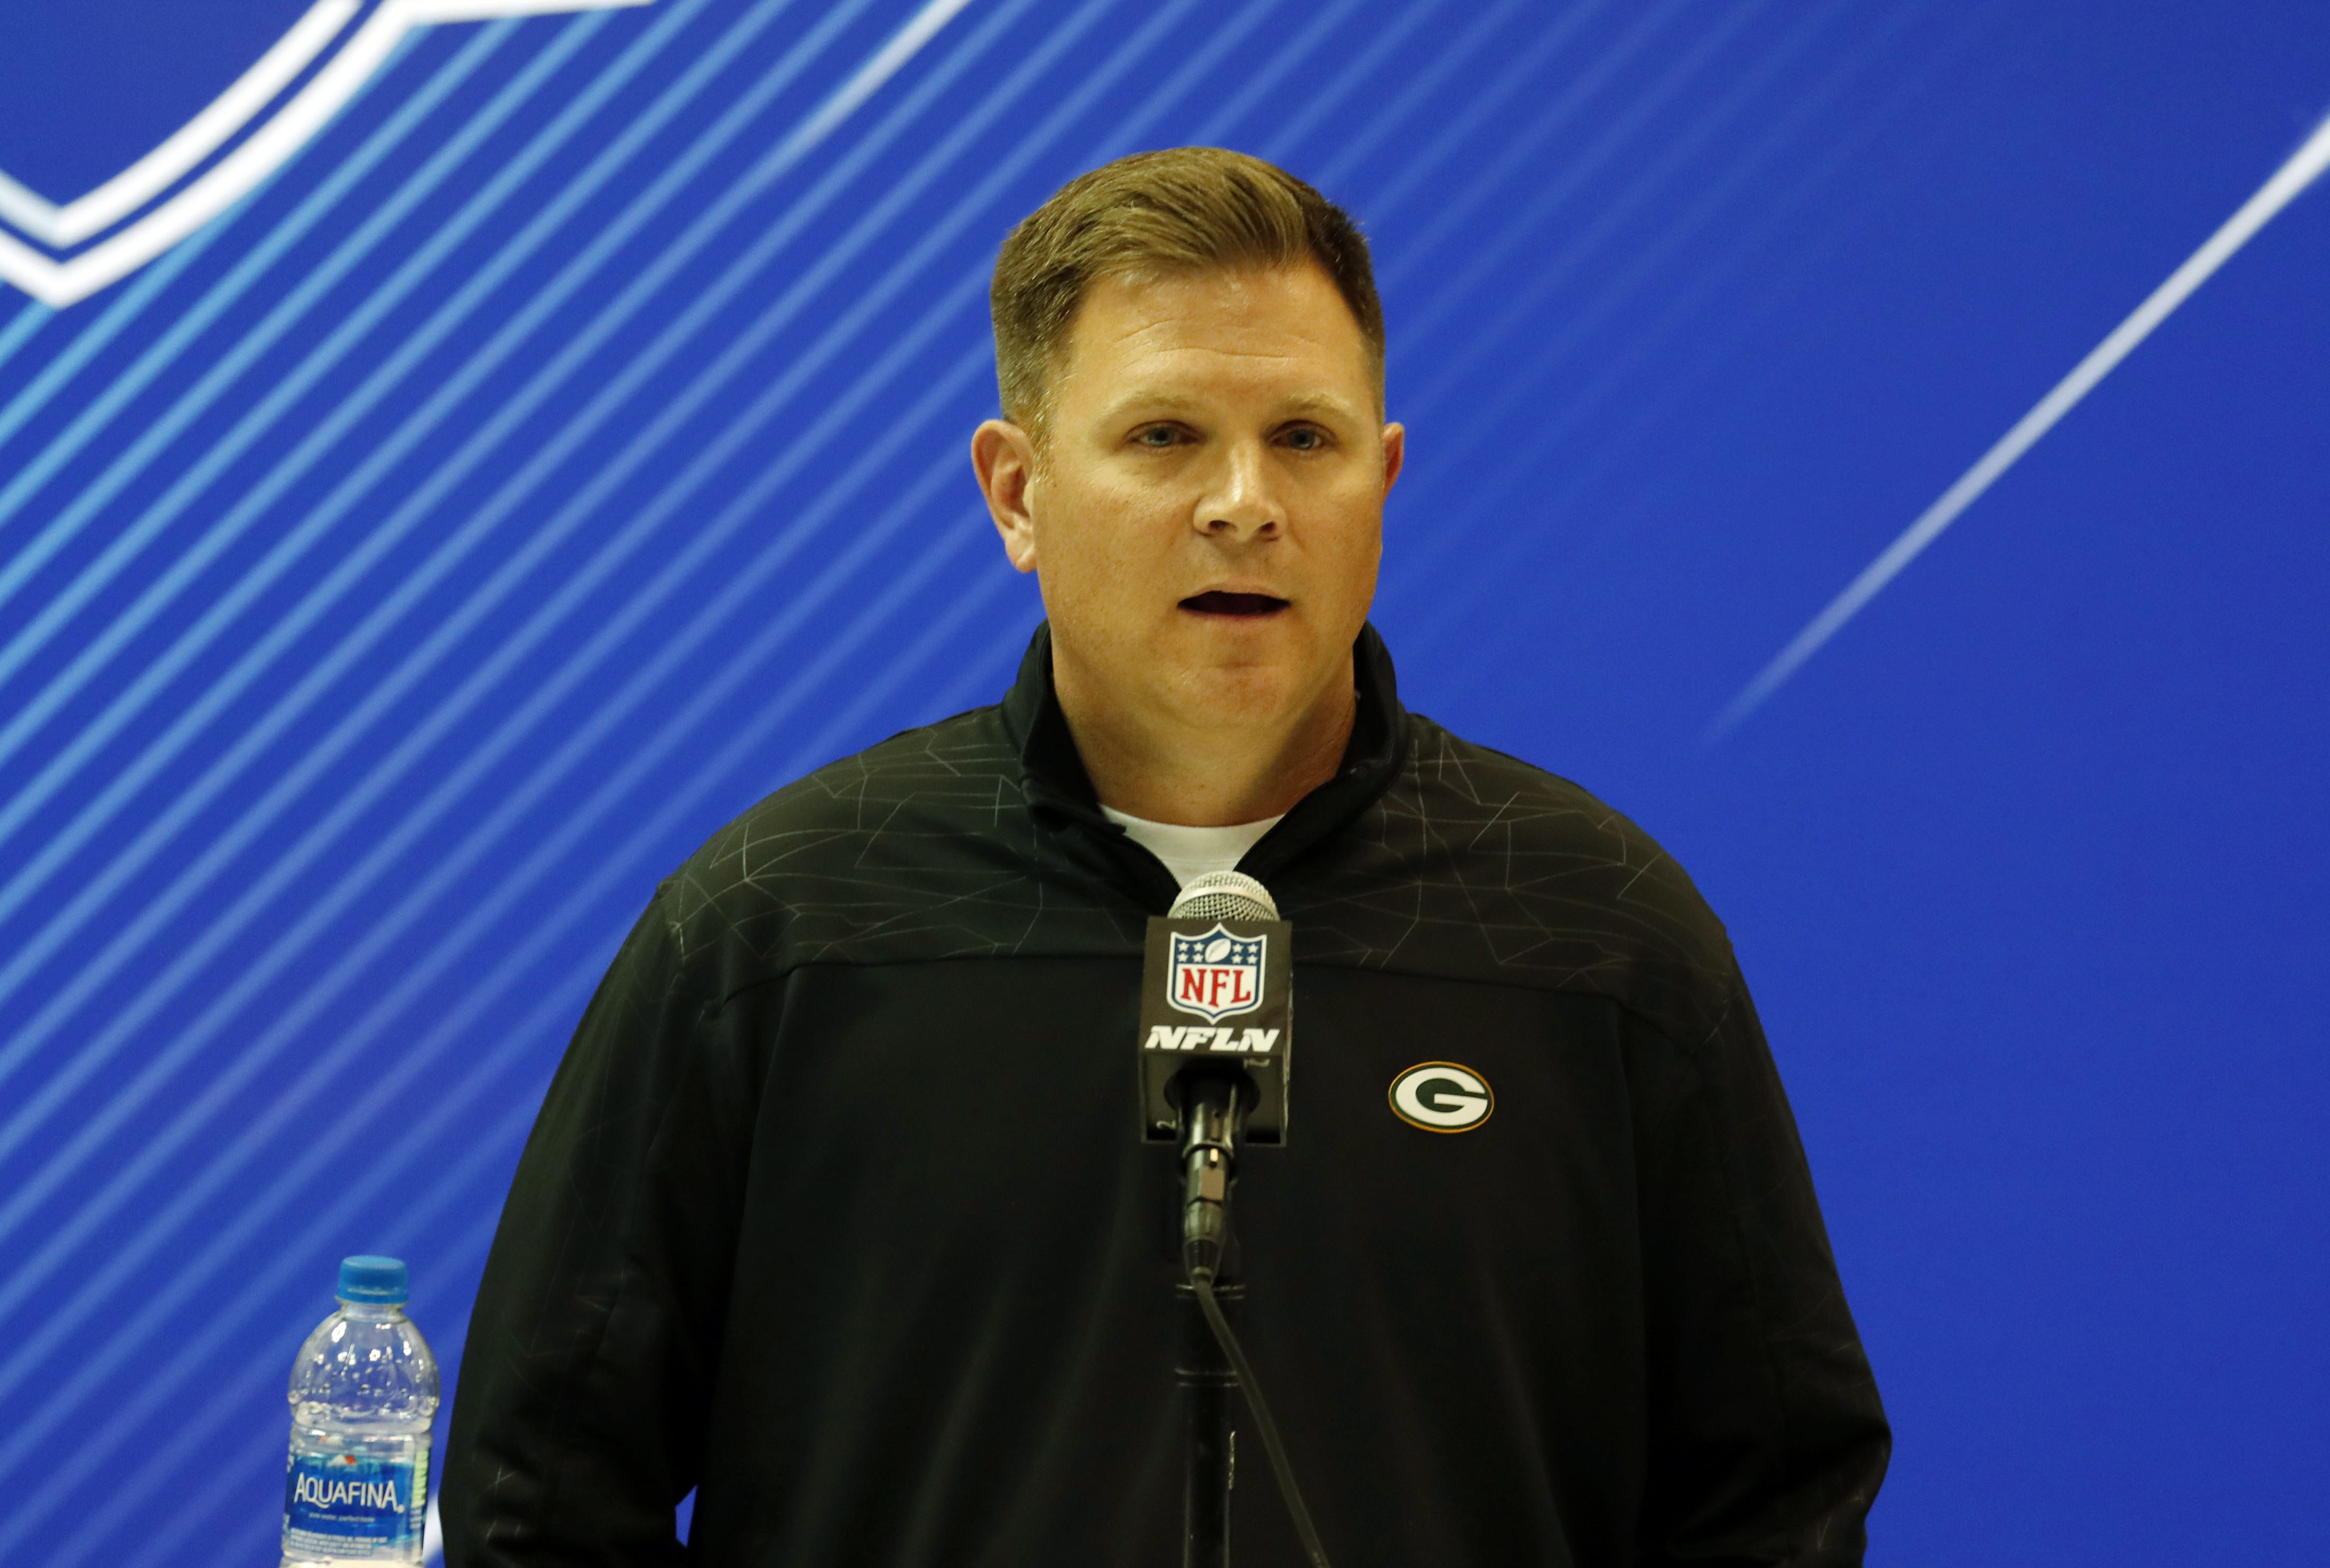 Packers GM Gutekunst Seeking Best Player Available in Draft